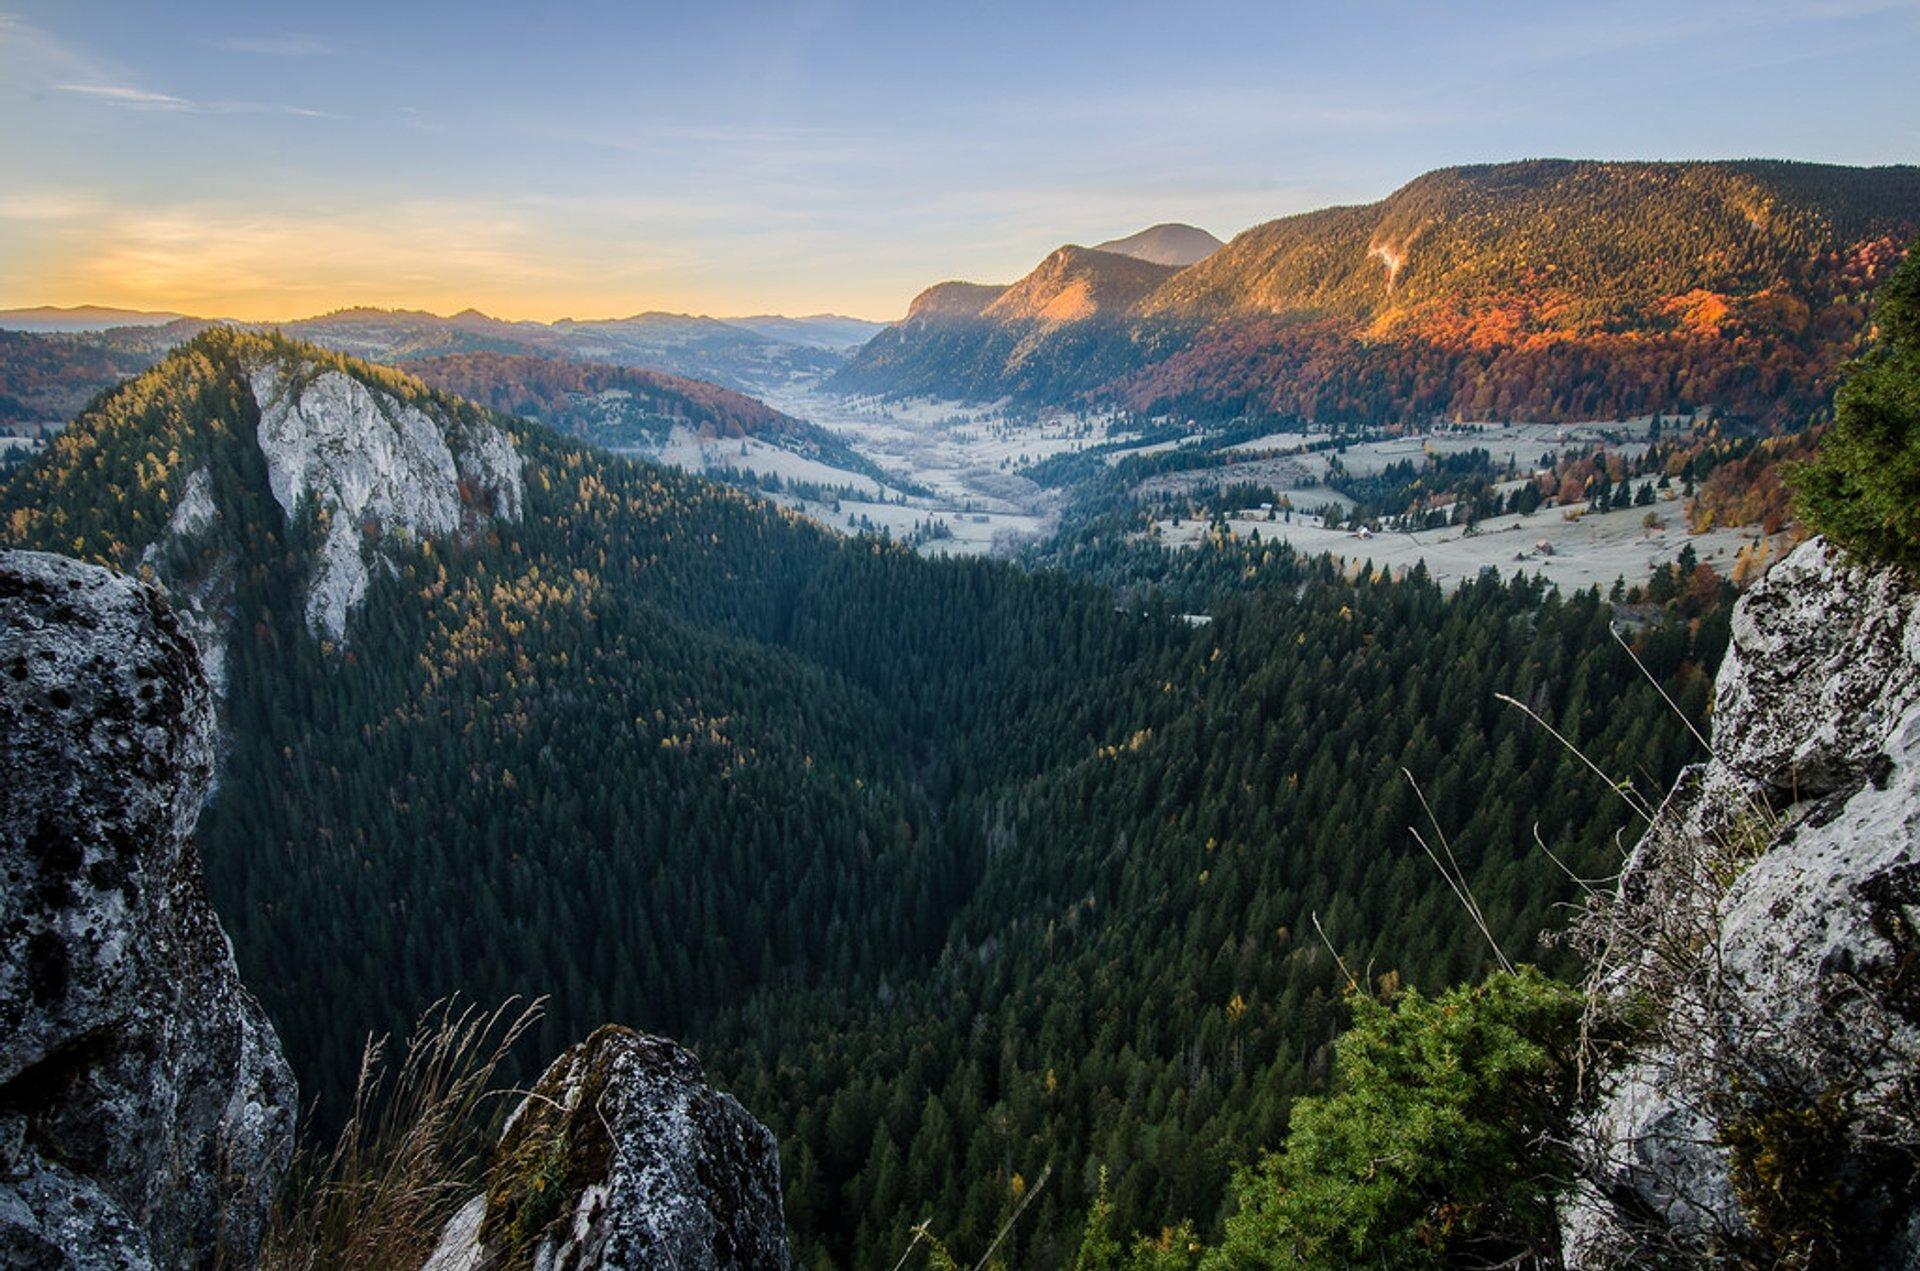 Raul Bicajel valley, Transylvania 2020